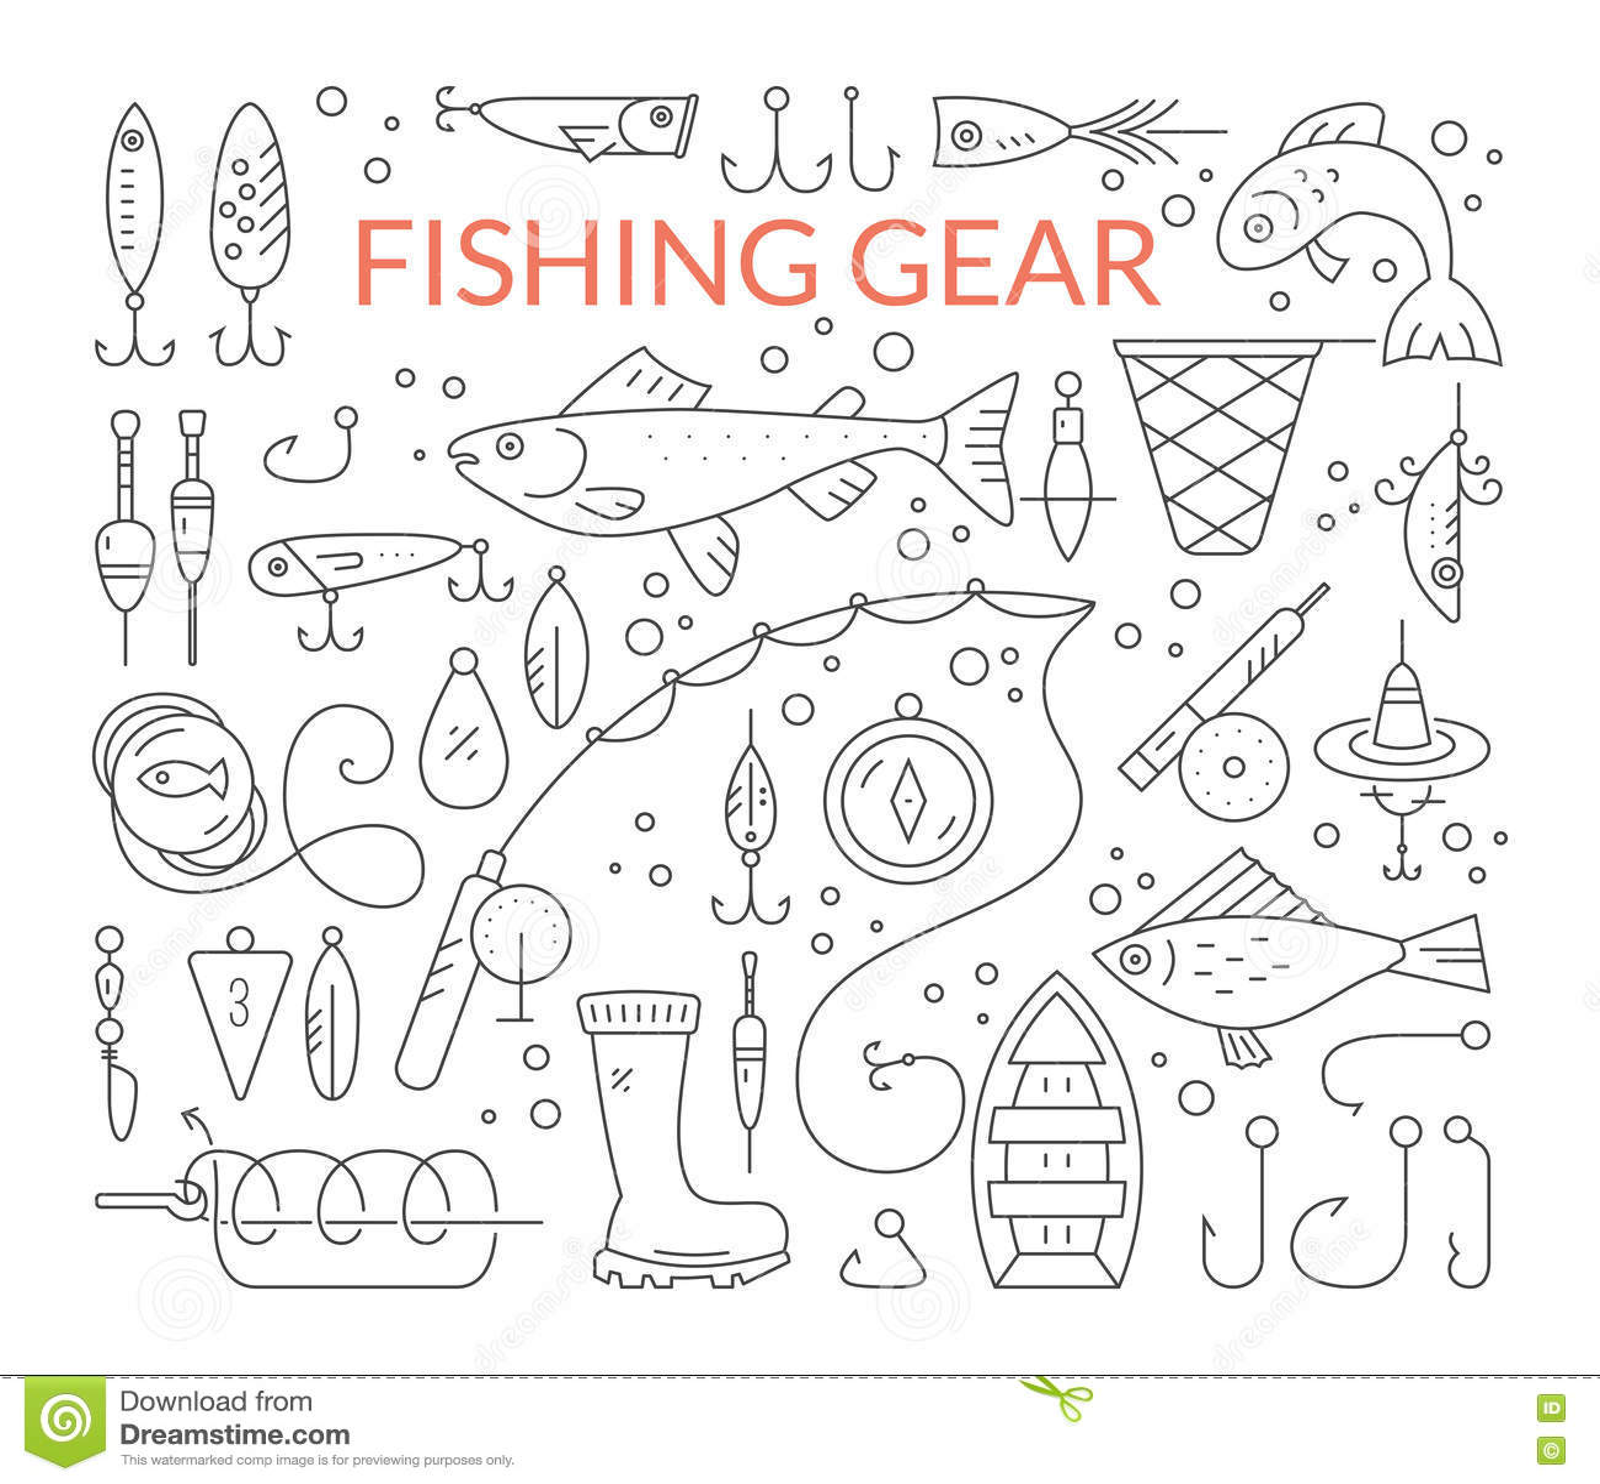 Fishing equipment stock vector. Image of aquatic, linear